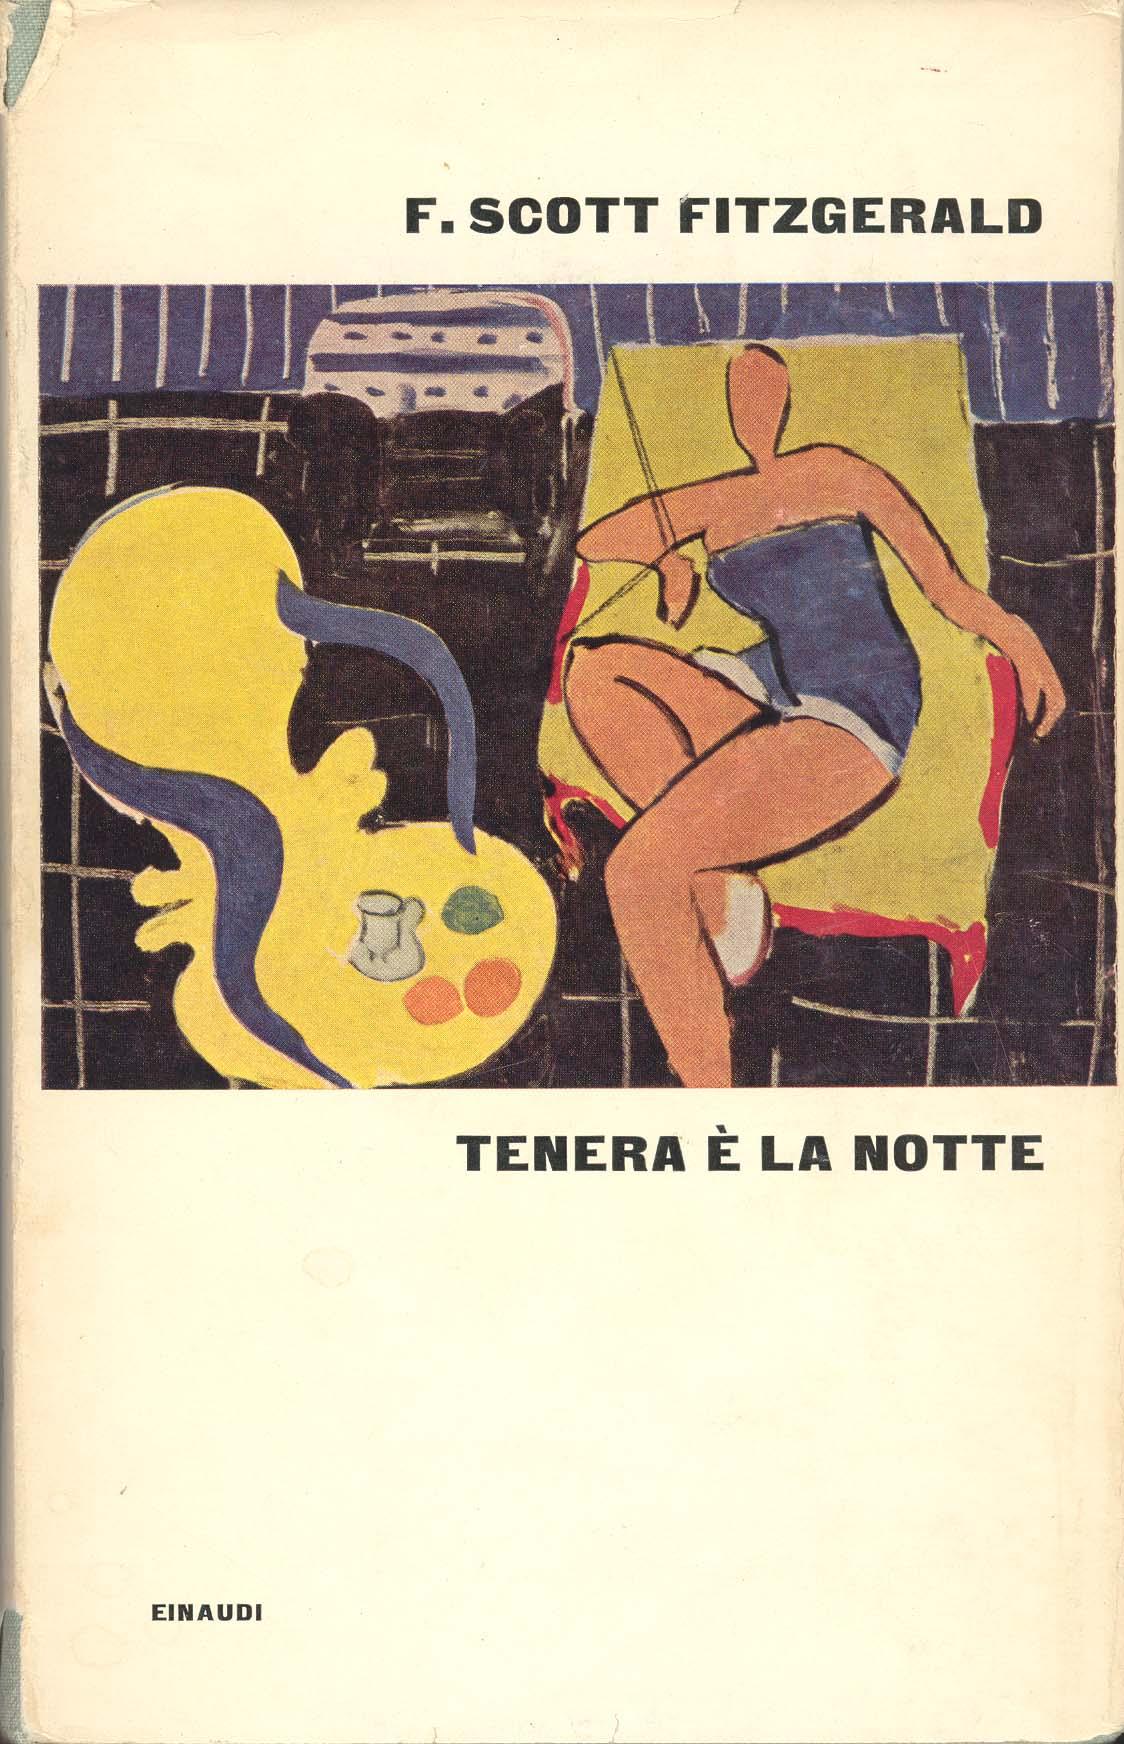 Image of Tenera è la notte